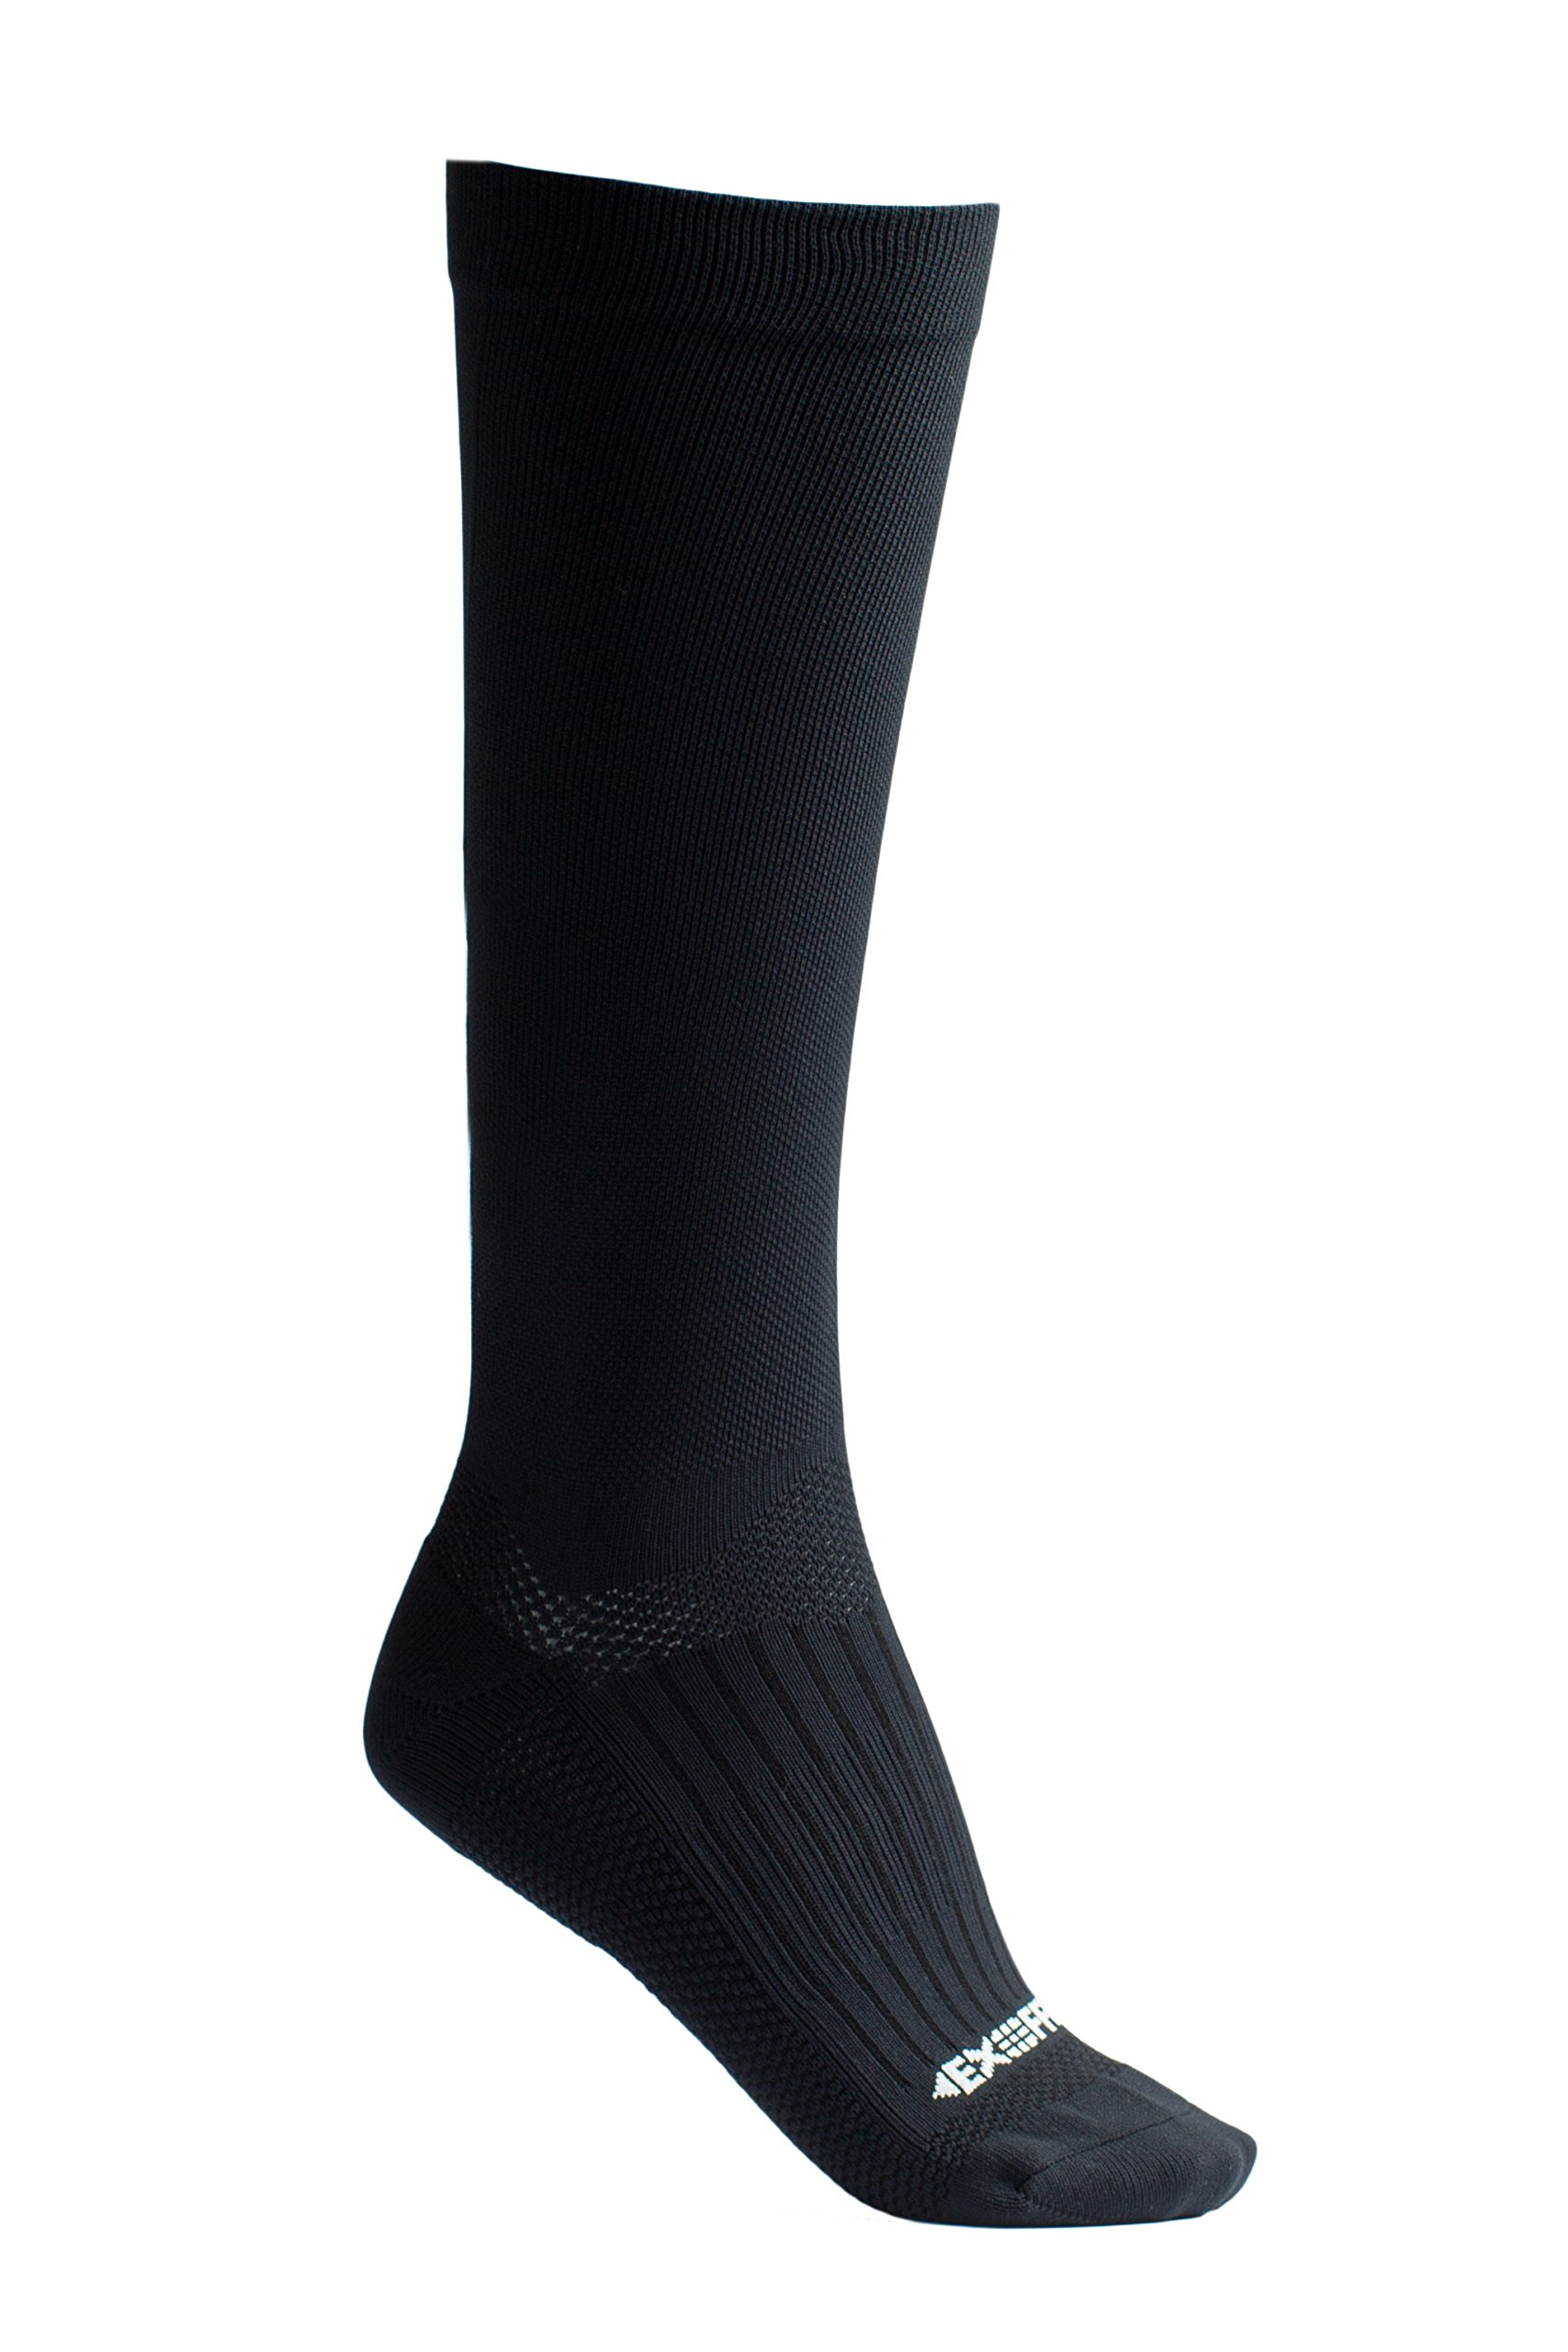 ExOfficio Women's Travel Compression Sock, Black, Small/Medium